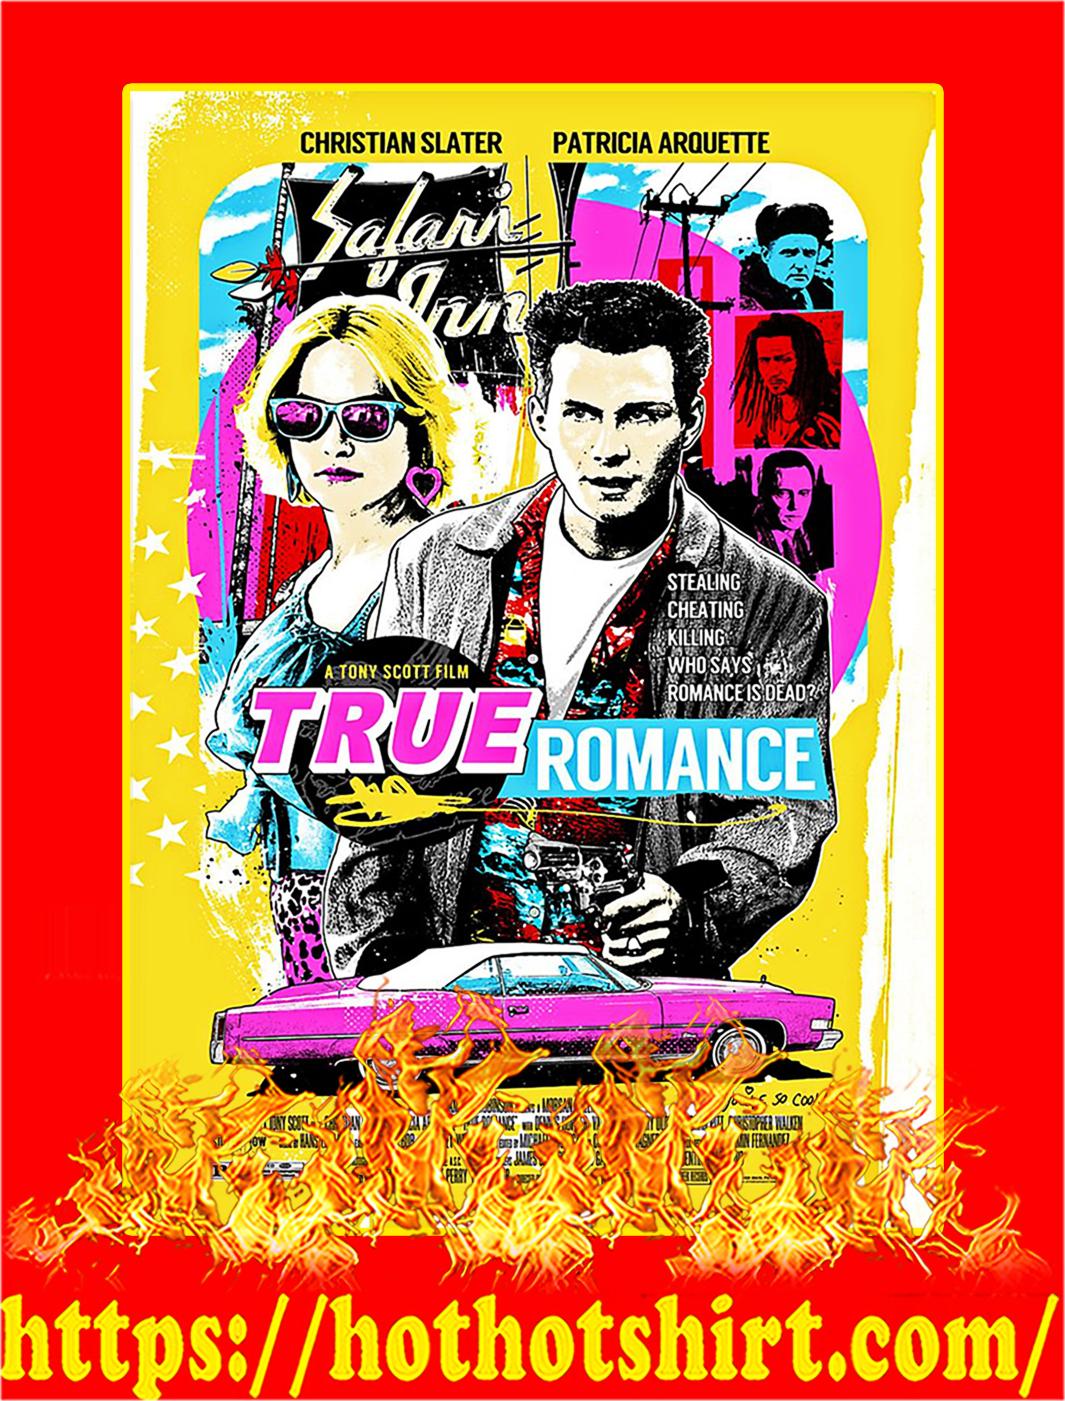 True Romance Poster - A1